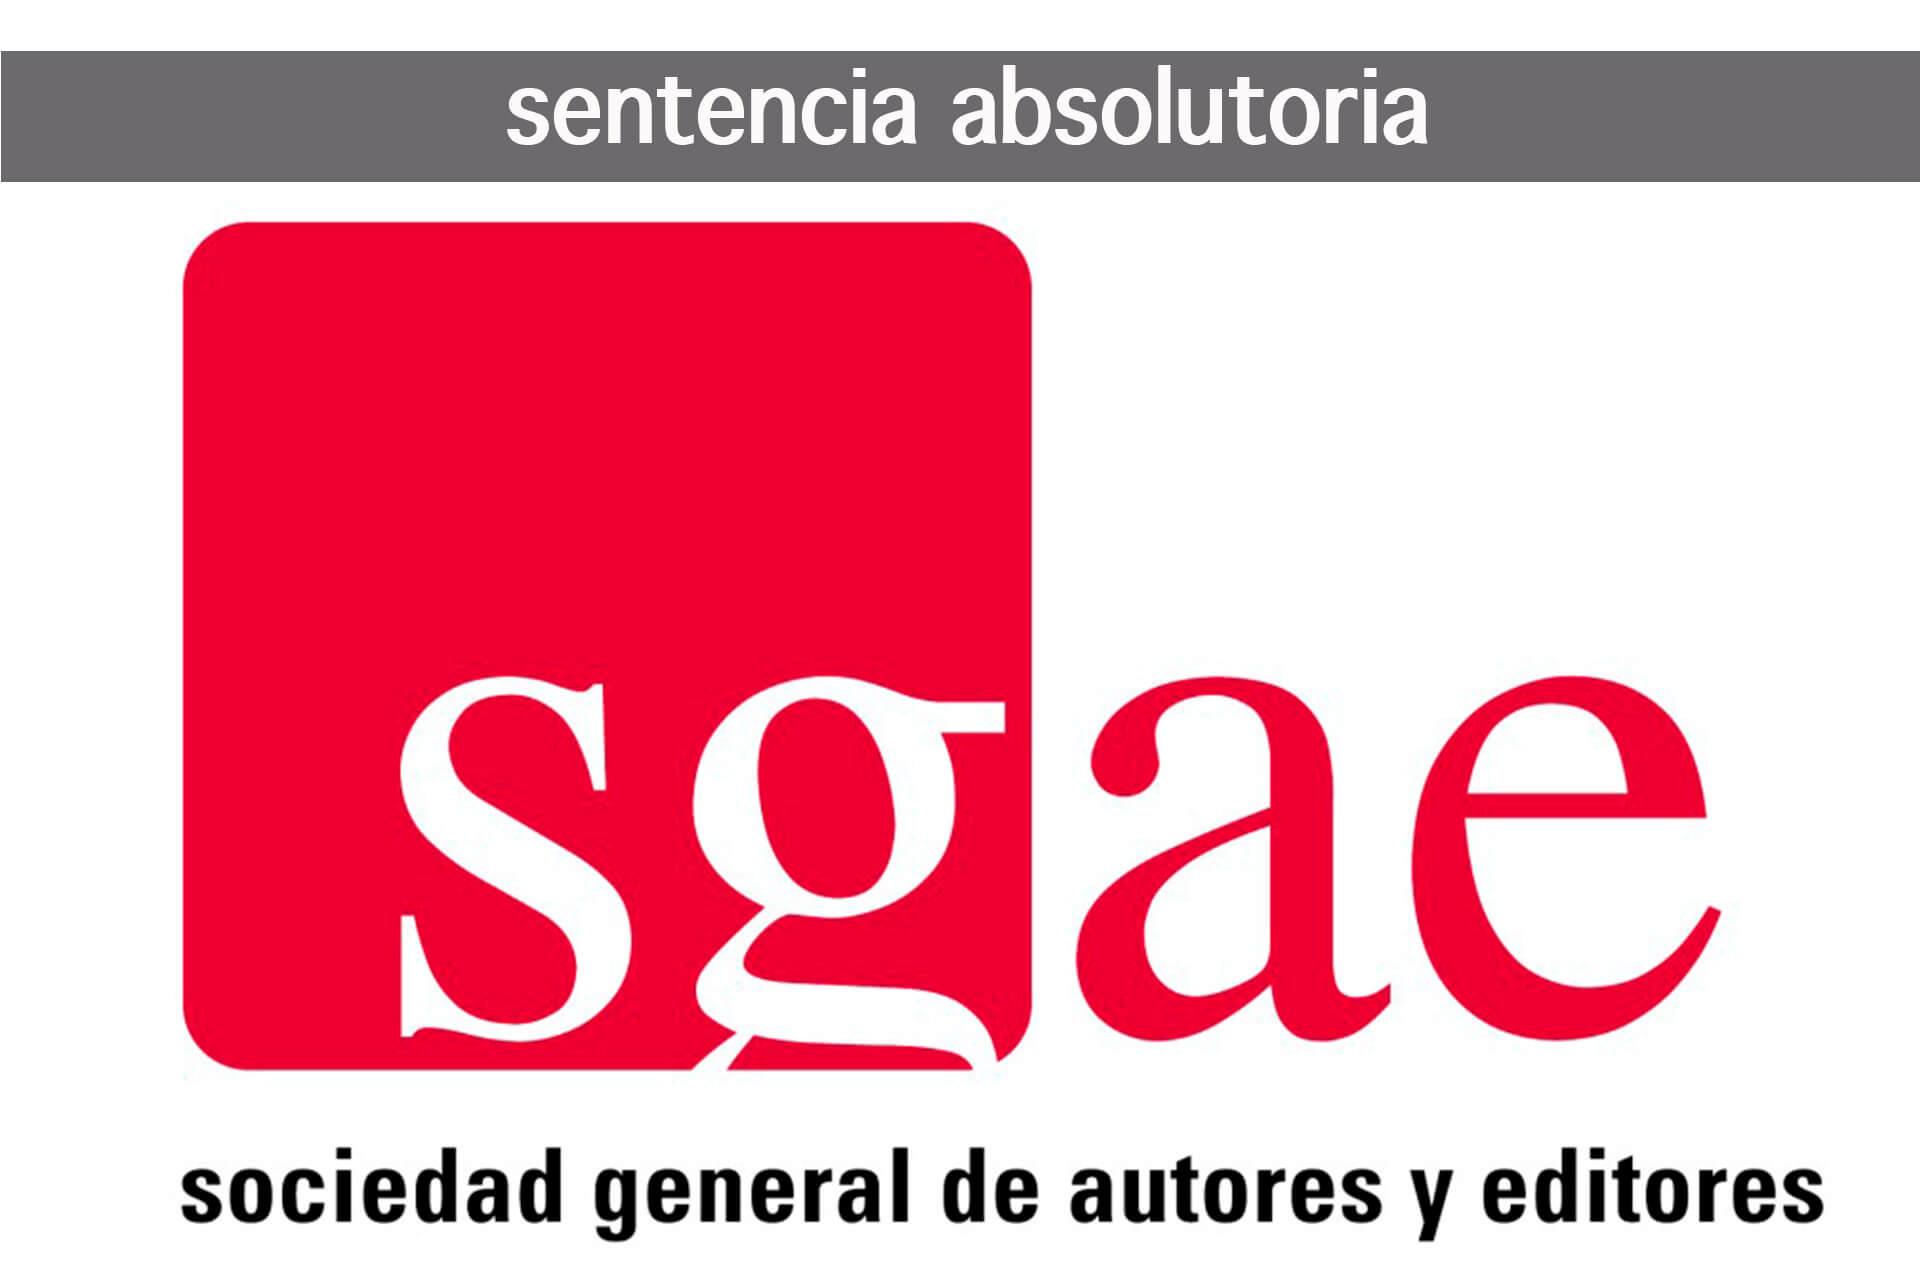 JulioSanchez_Abogados_Redlex_SGAE_Sentencia_Absolutoria